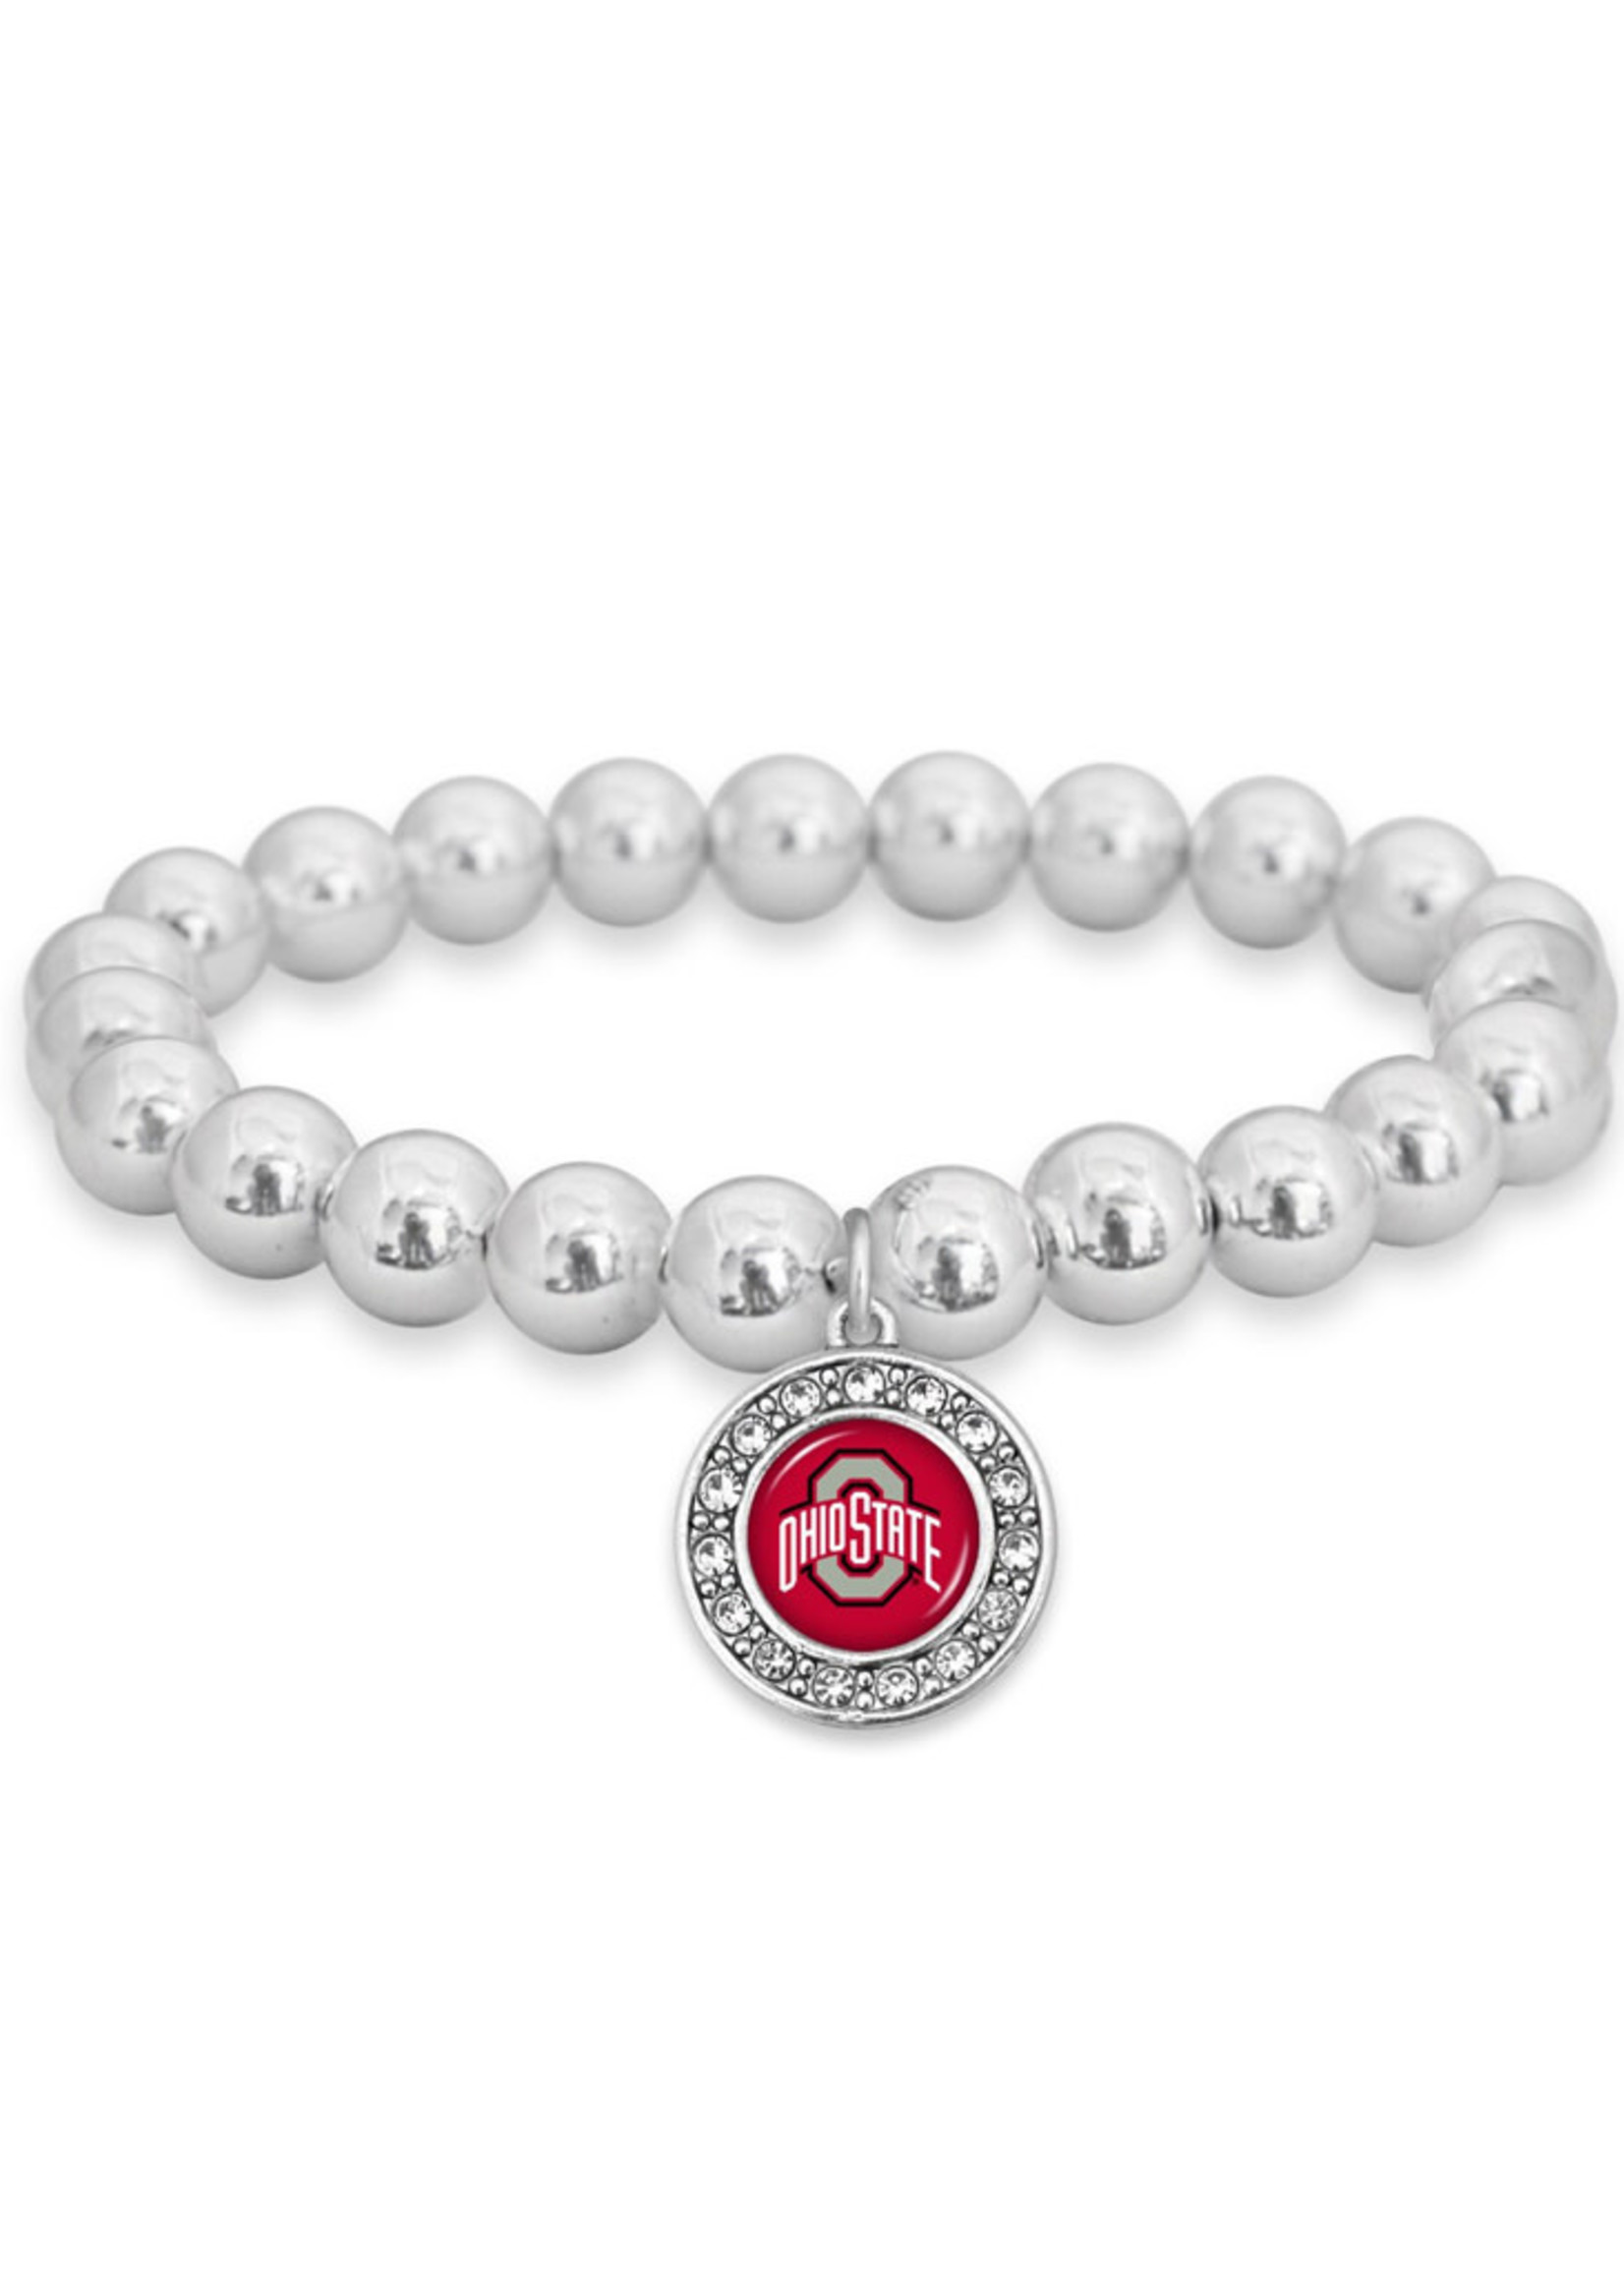 Ohio State Buckeyes Stretch Bracelet- Abby Girl